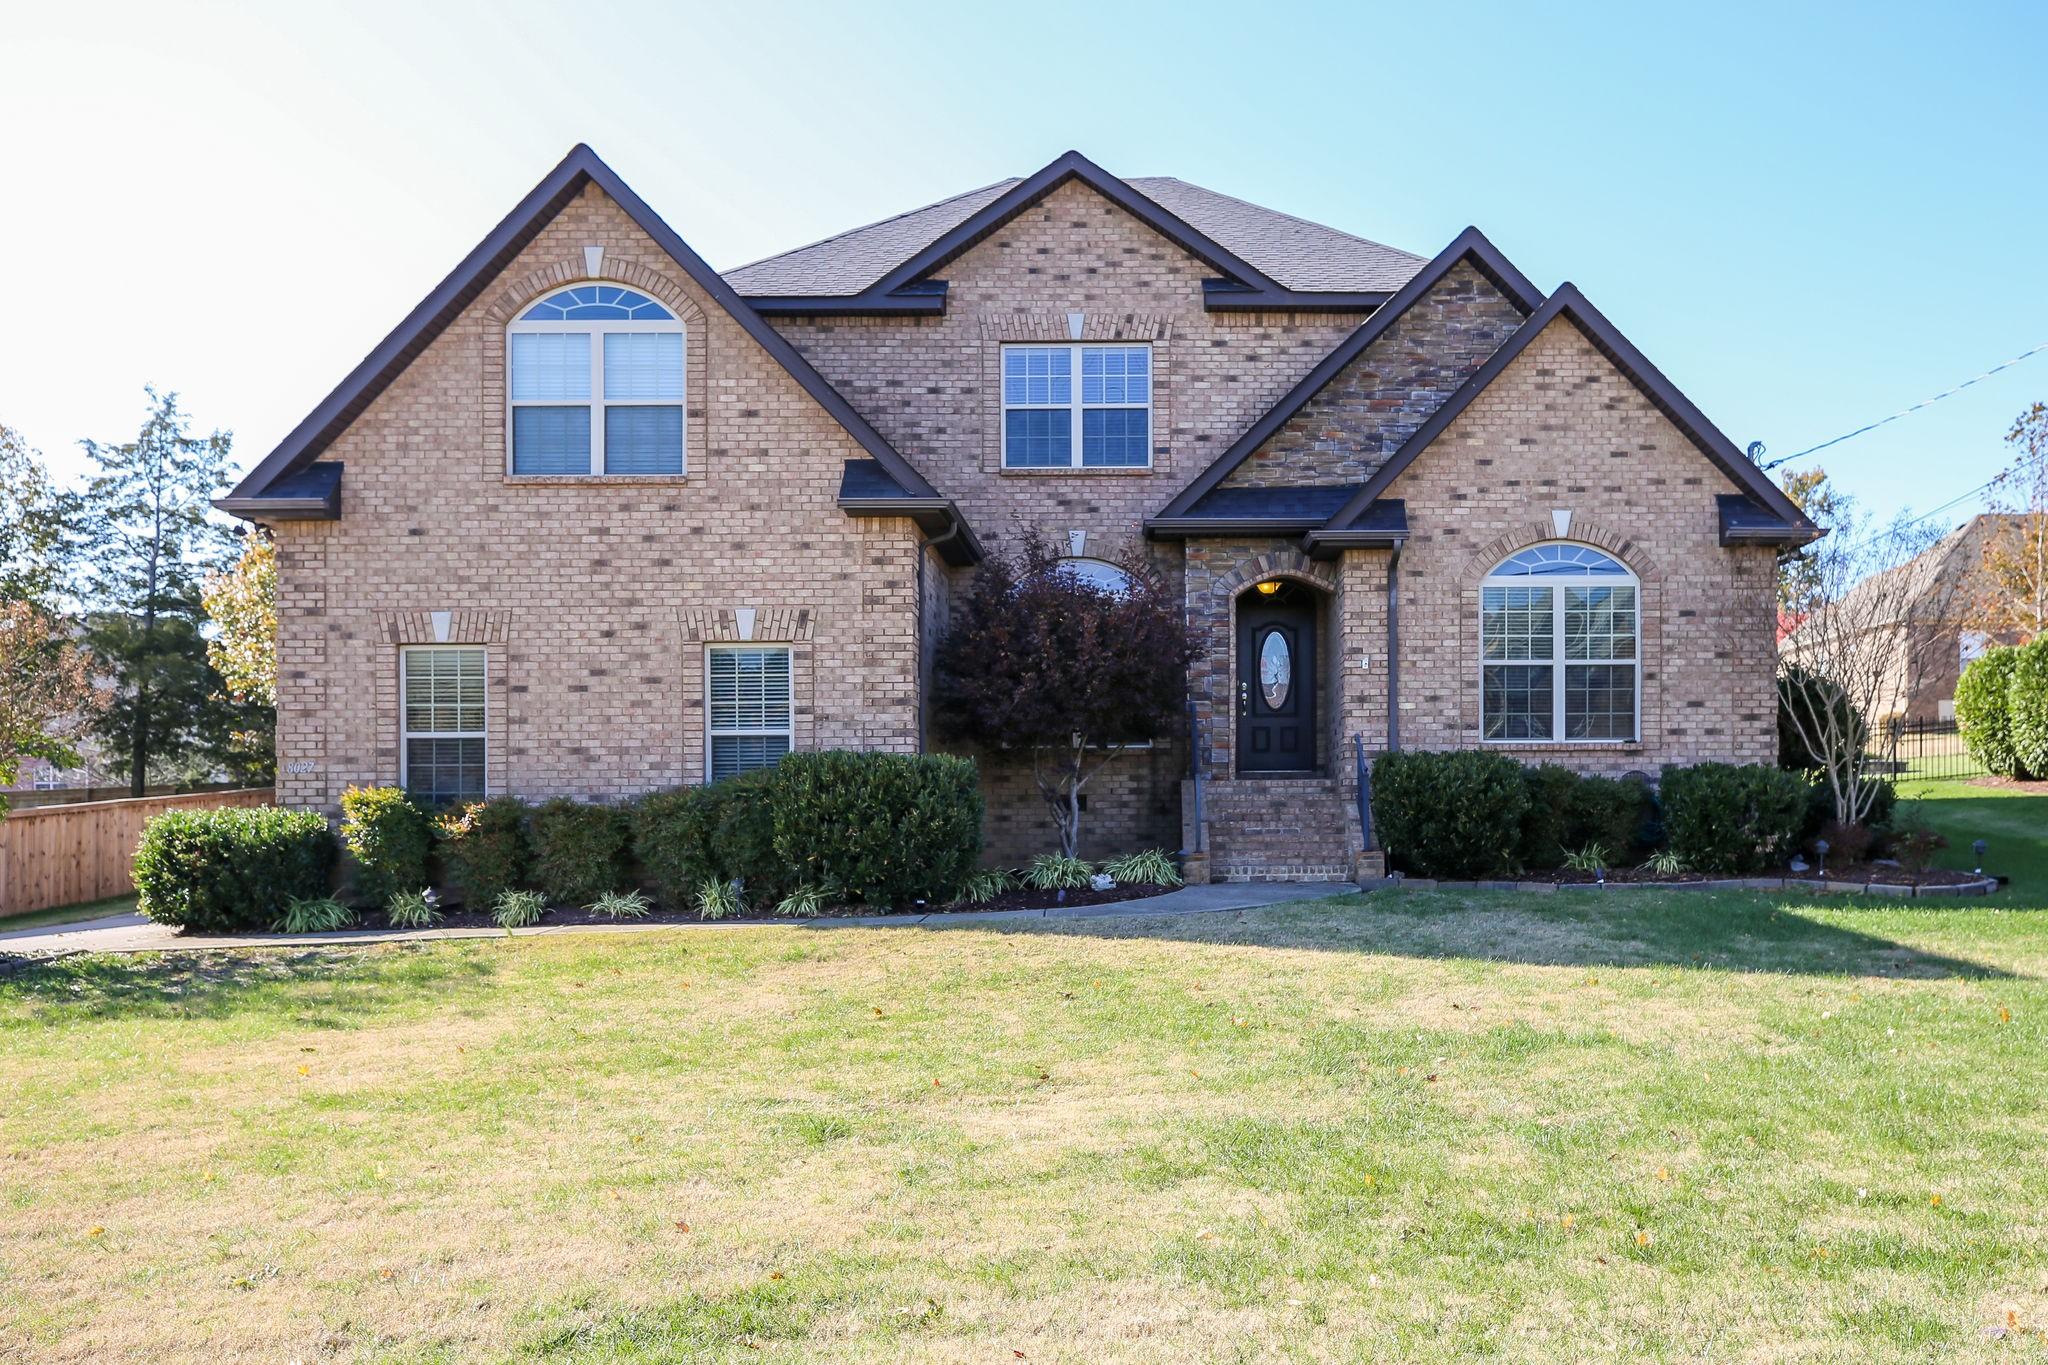 8027 Vineyard Ln, LA VERGNE, TN 37086 - LA VERGNE, TN real estate listing